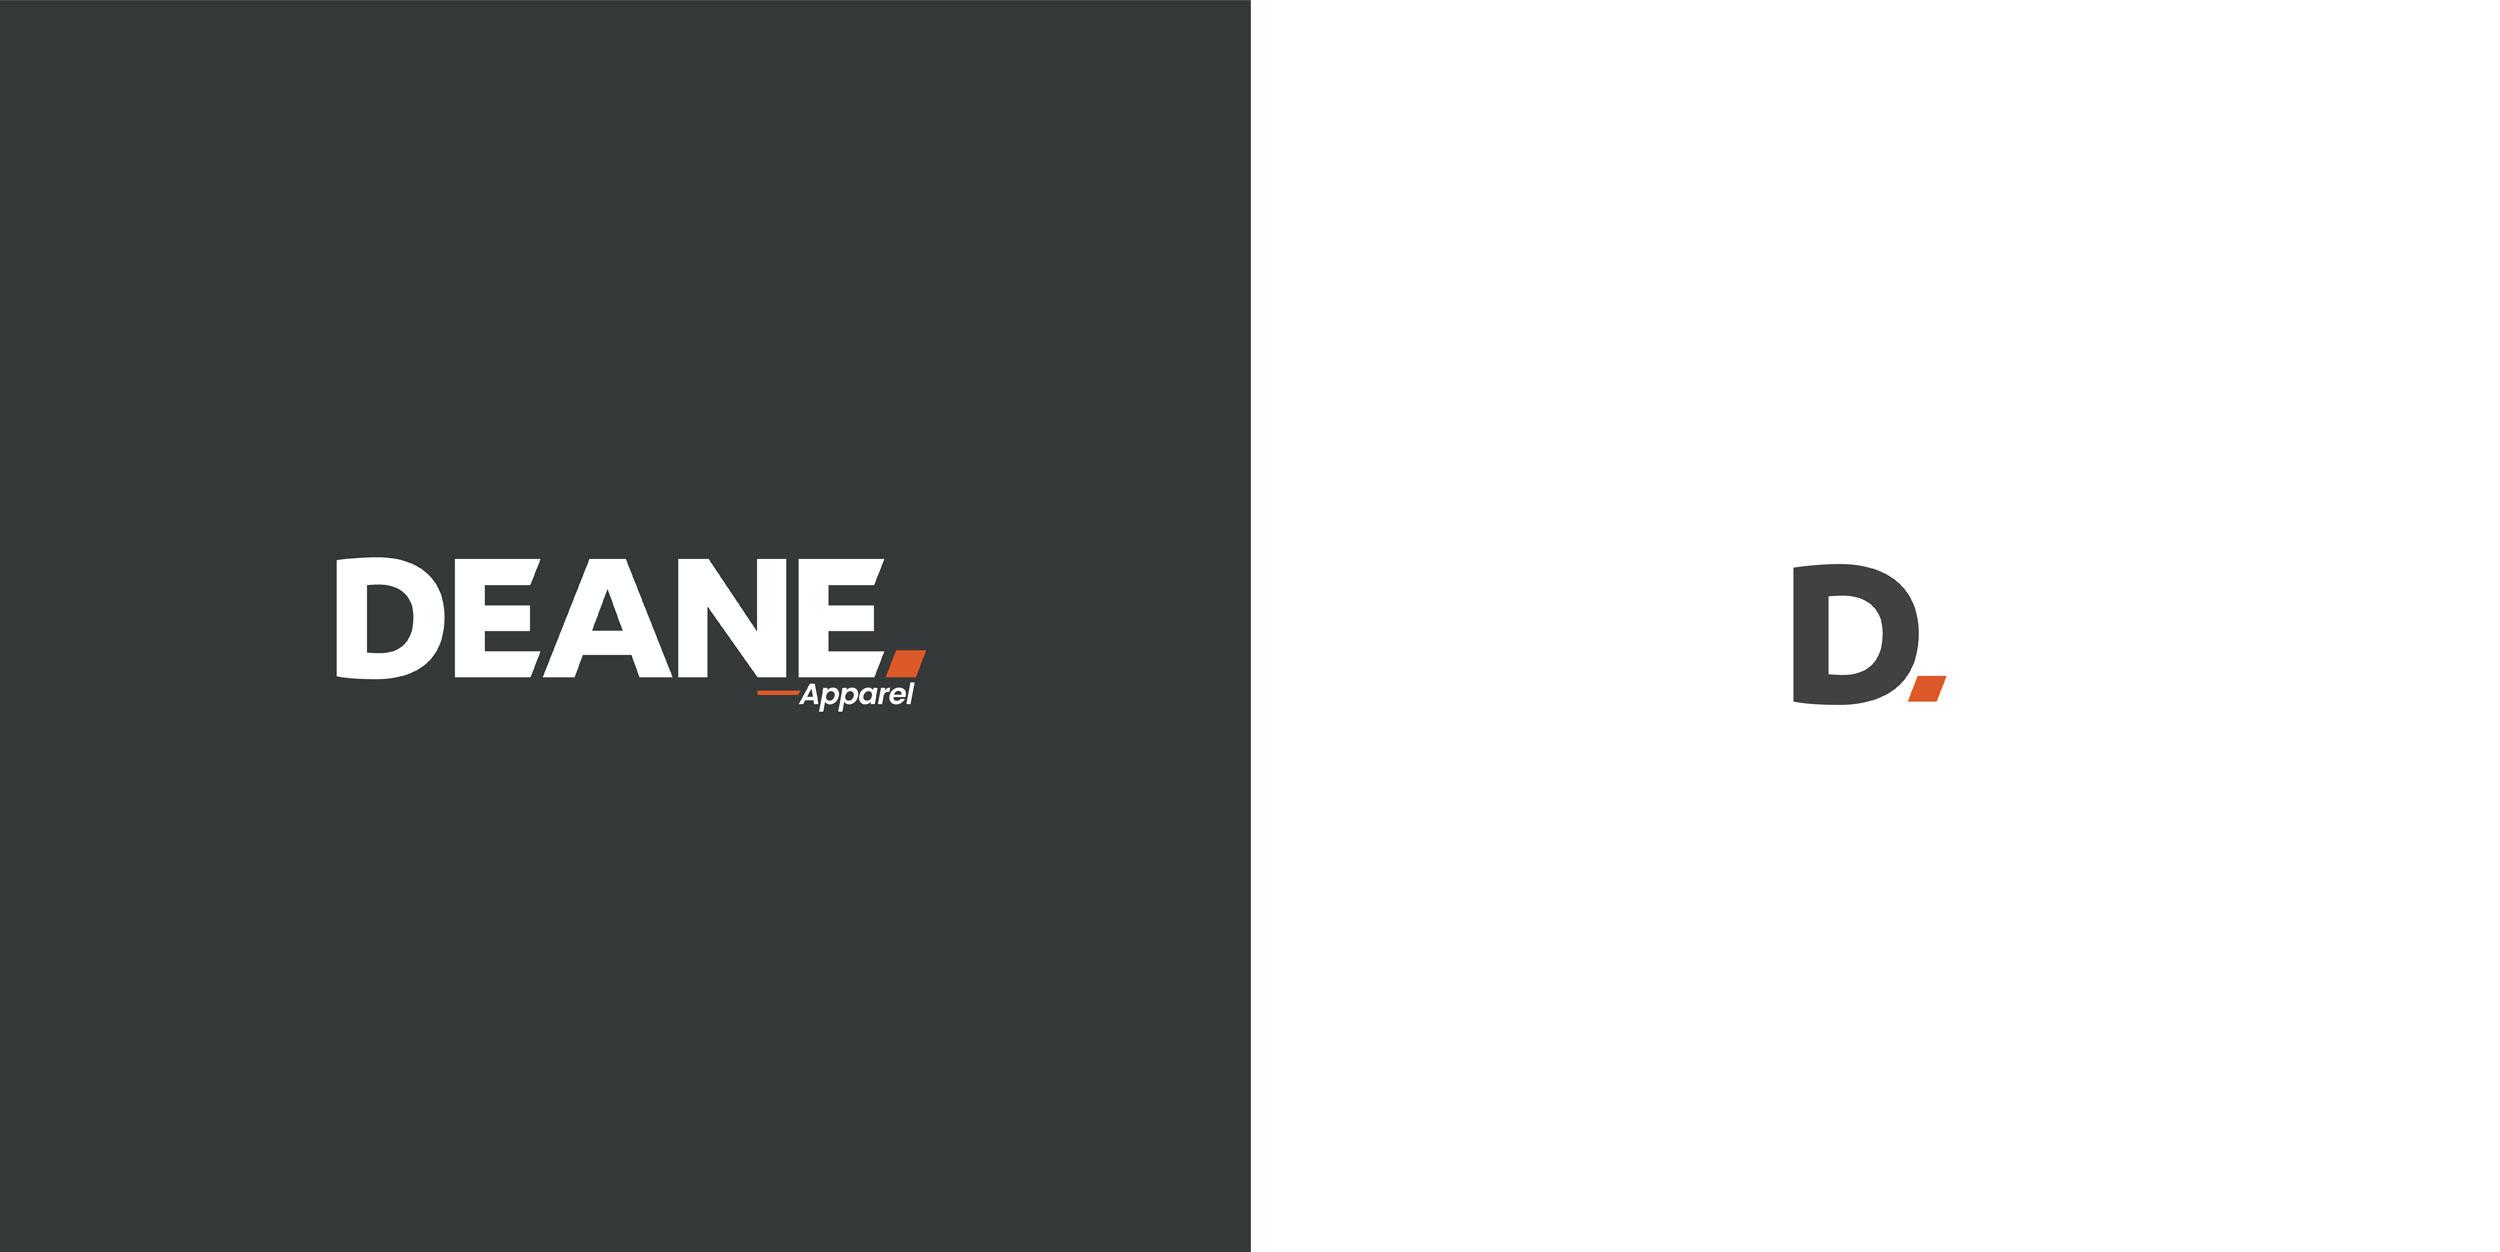 Deane_case-study-2.jpg